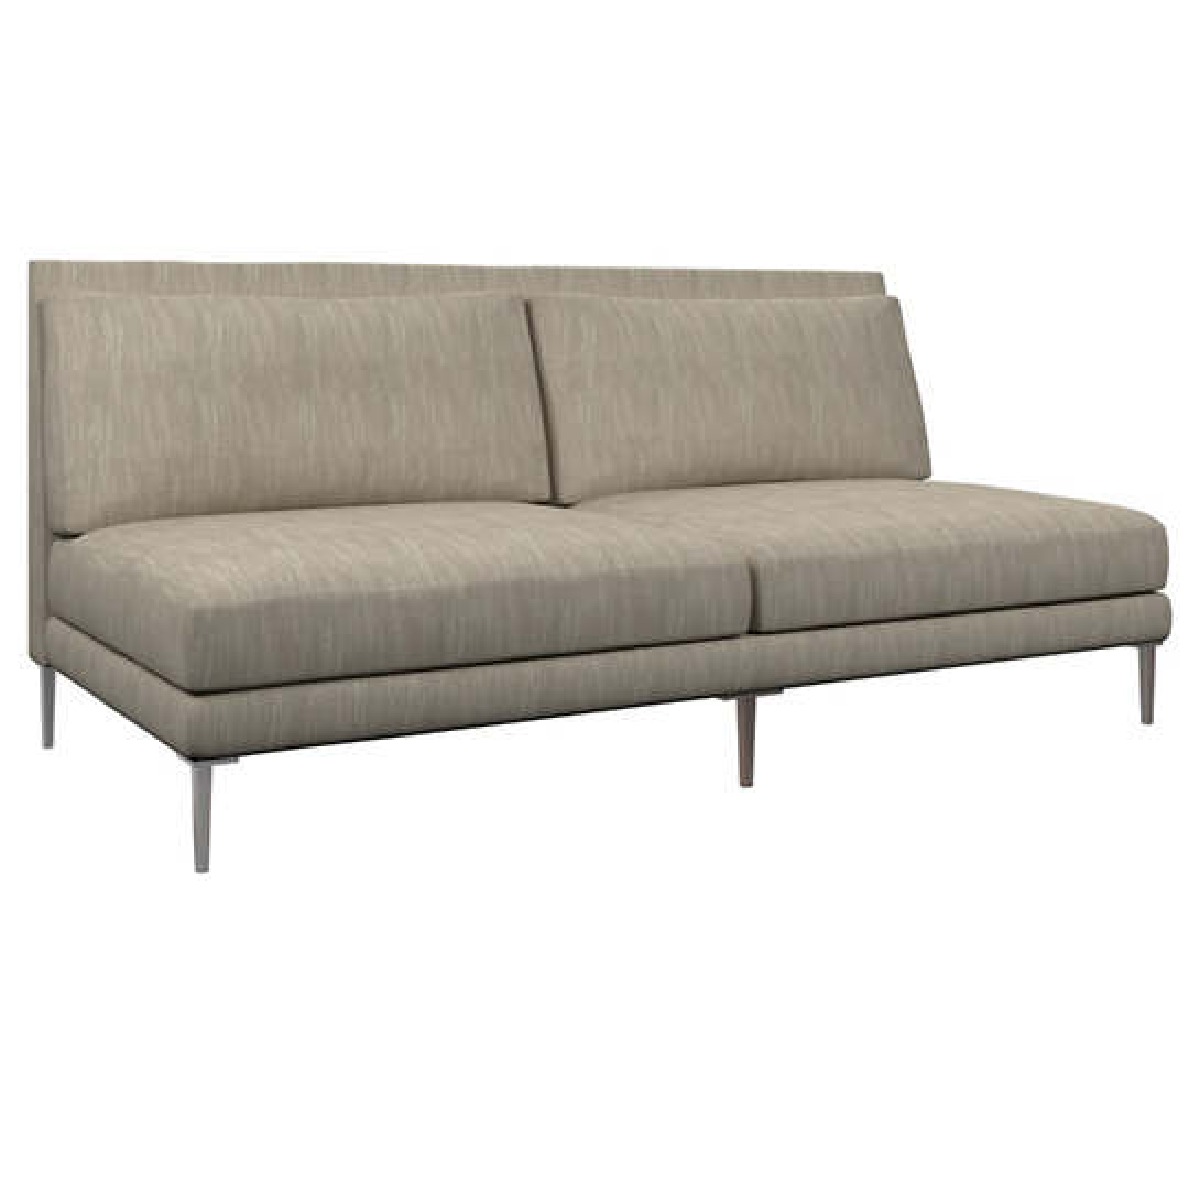 Graduate Linen Portola Sofa